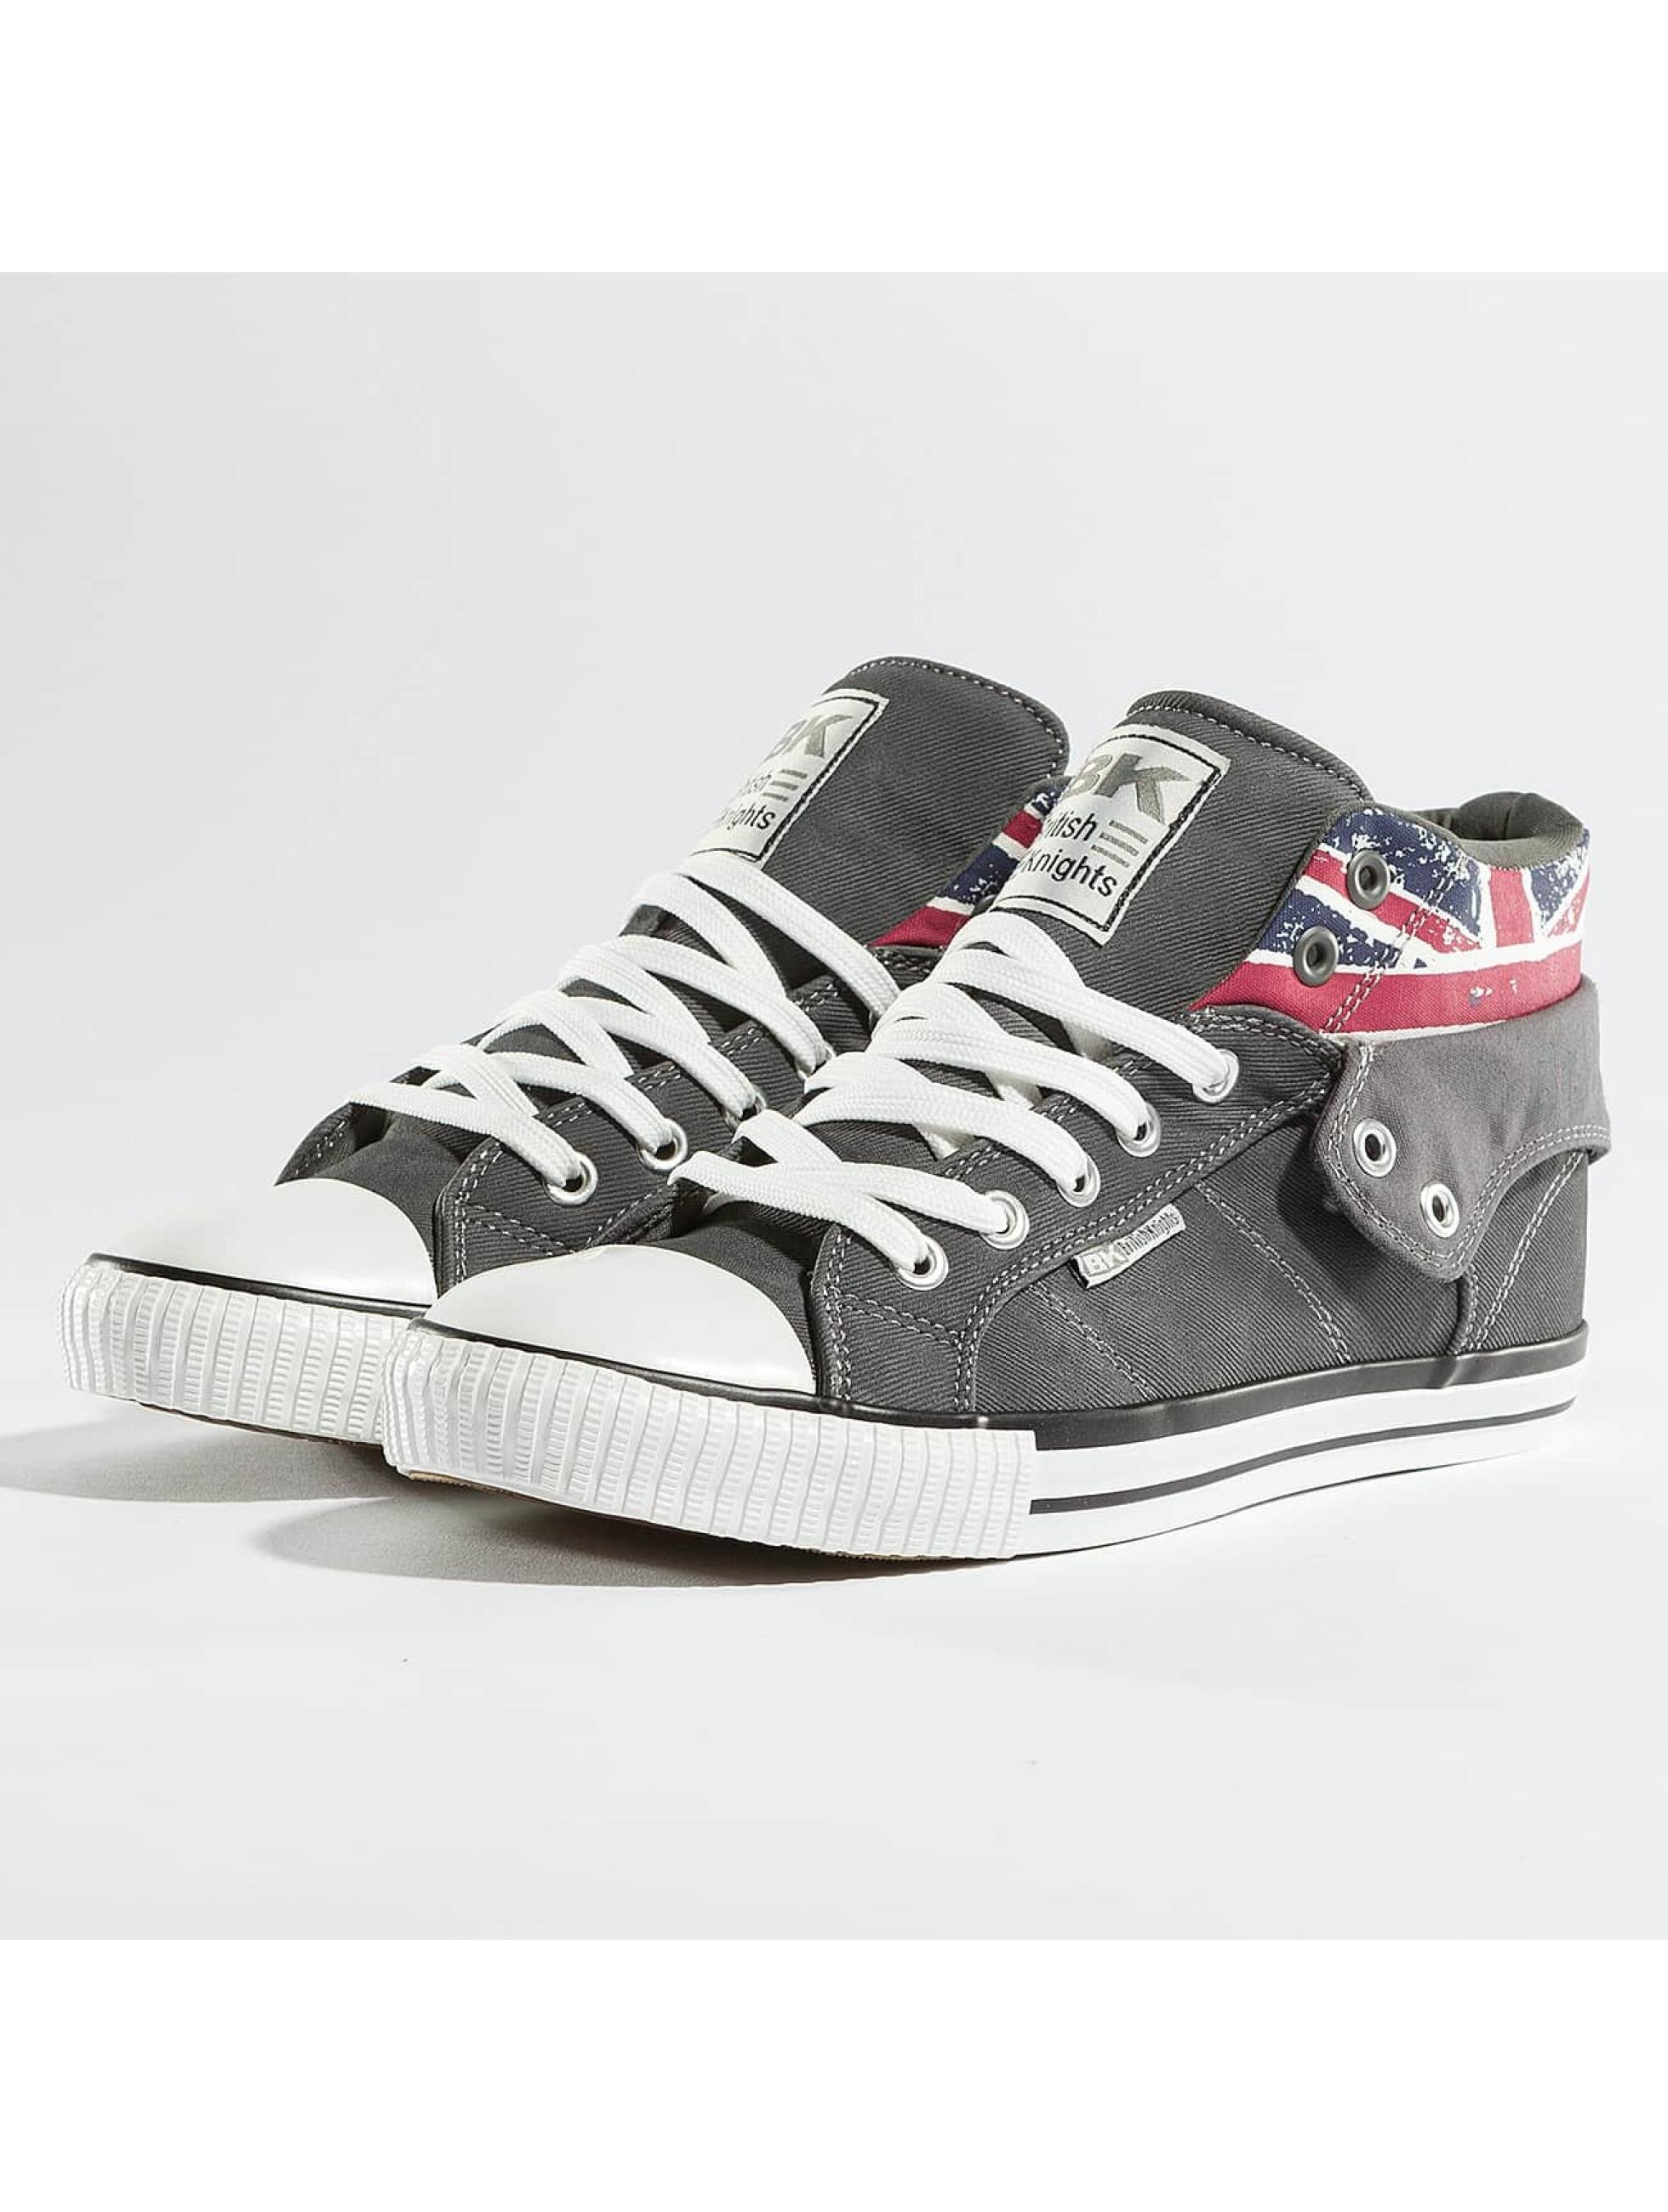 Chevaliers Britanniques Gris Kunzo Chaussures 39 Hommes S7EmvSP